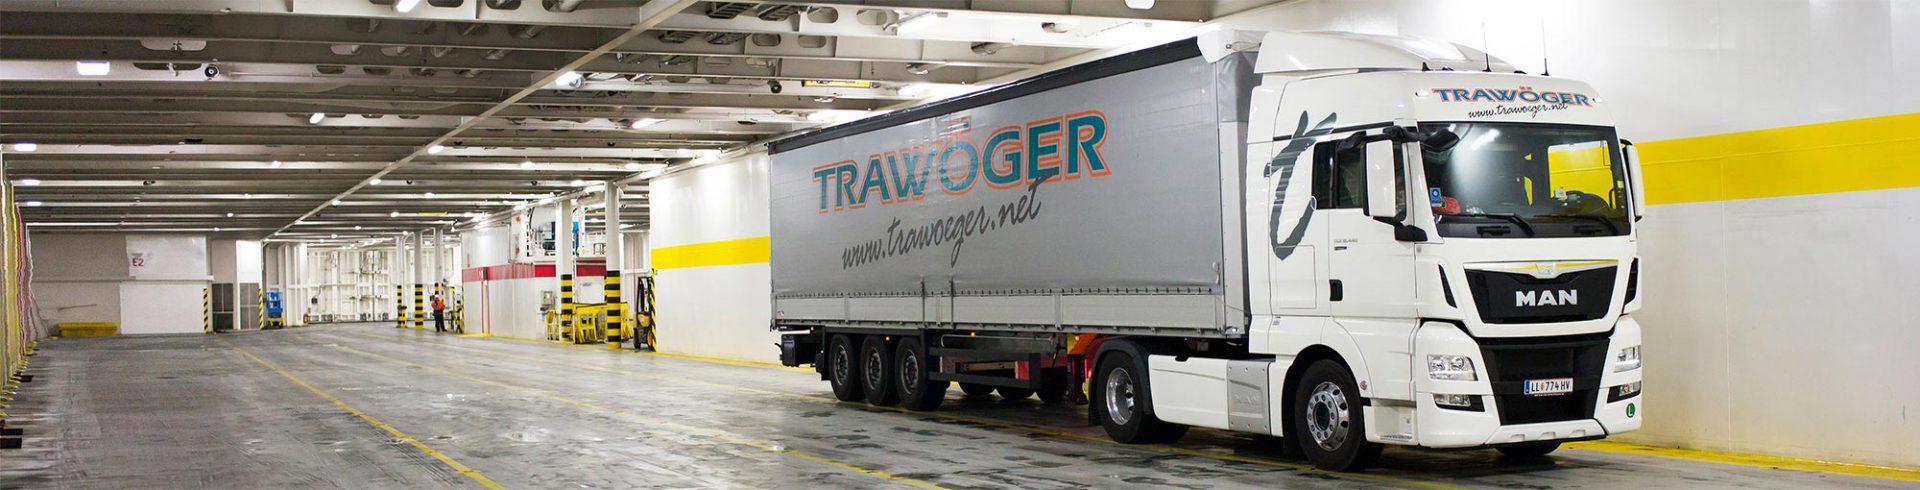 TRAWÖGER TRANSPORT GMBH